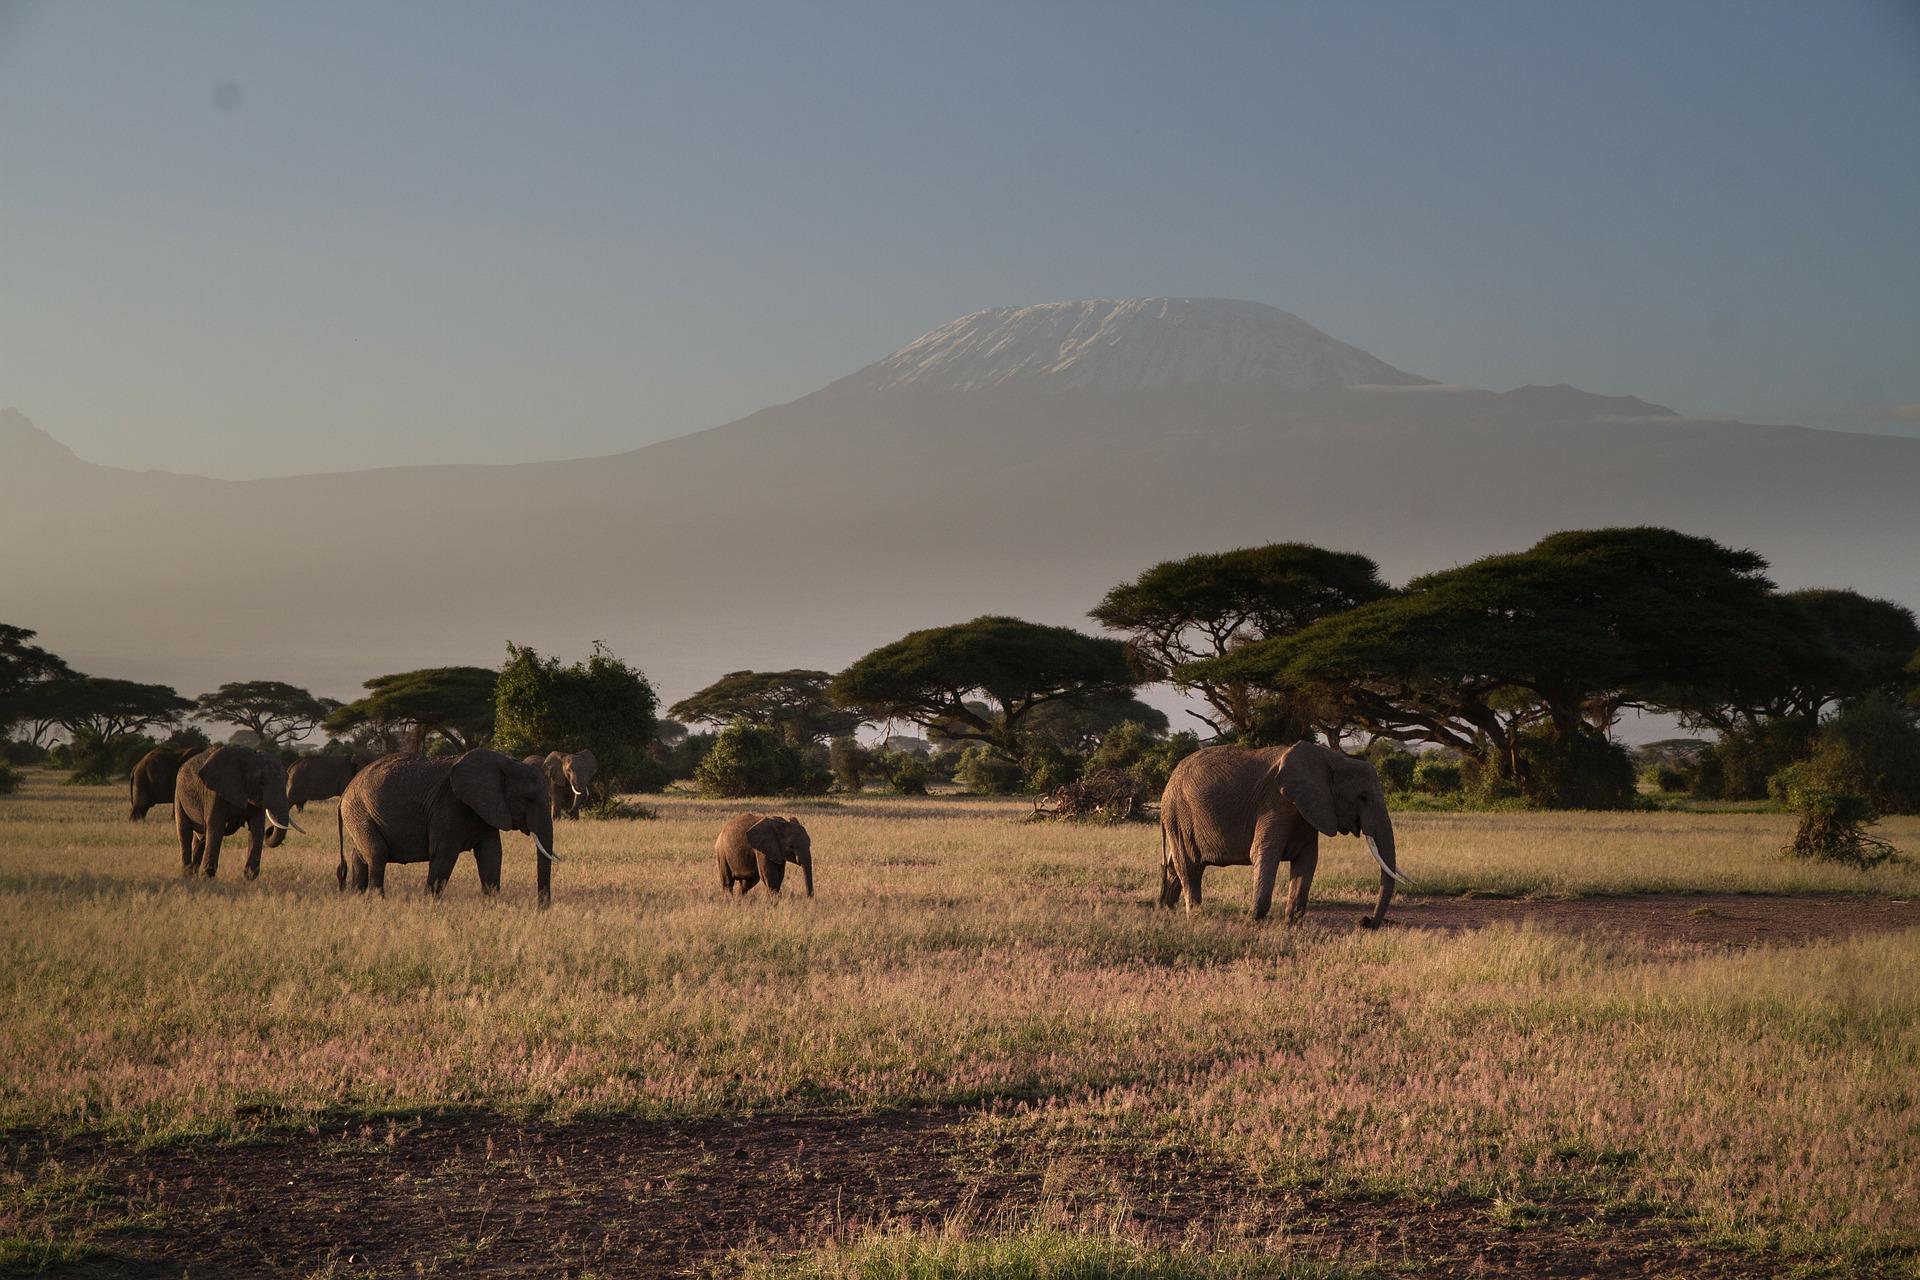 elephant-279992_1920